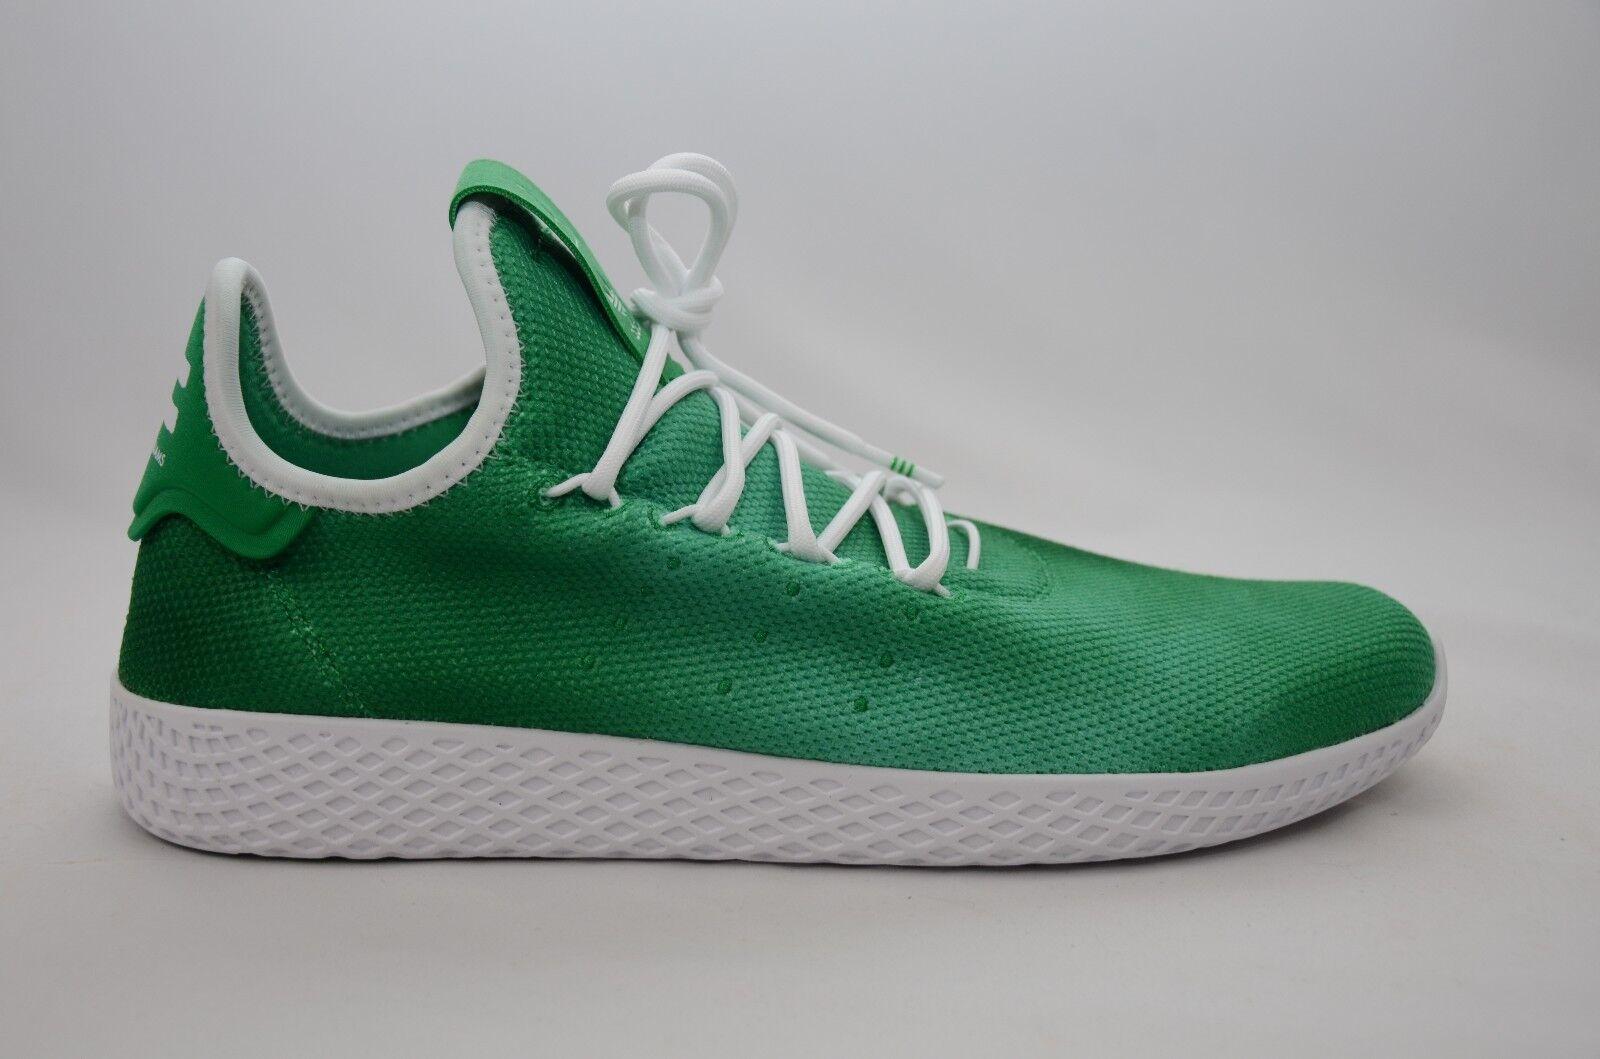 Adidas PW HU HOLI Tennis Hu Green White Men's Size 10 New in Box DA9619